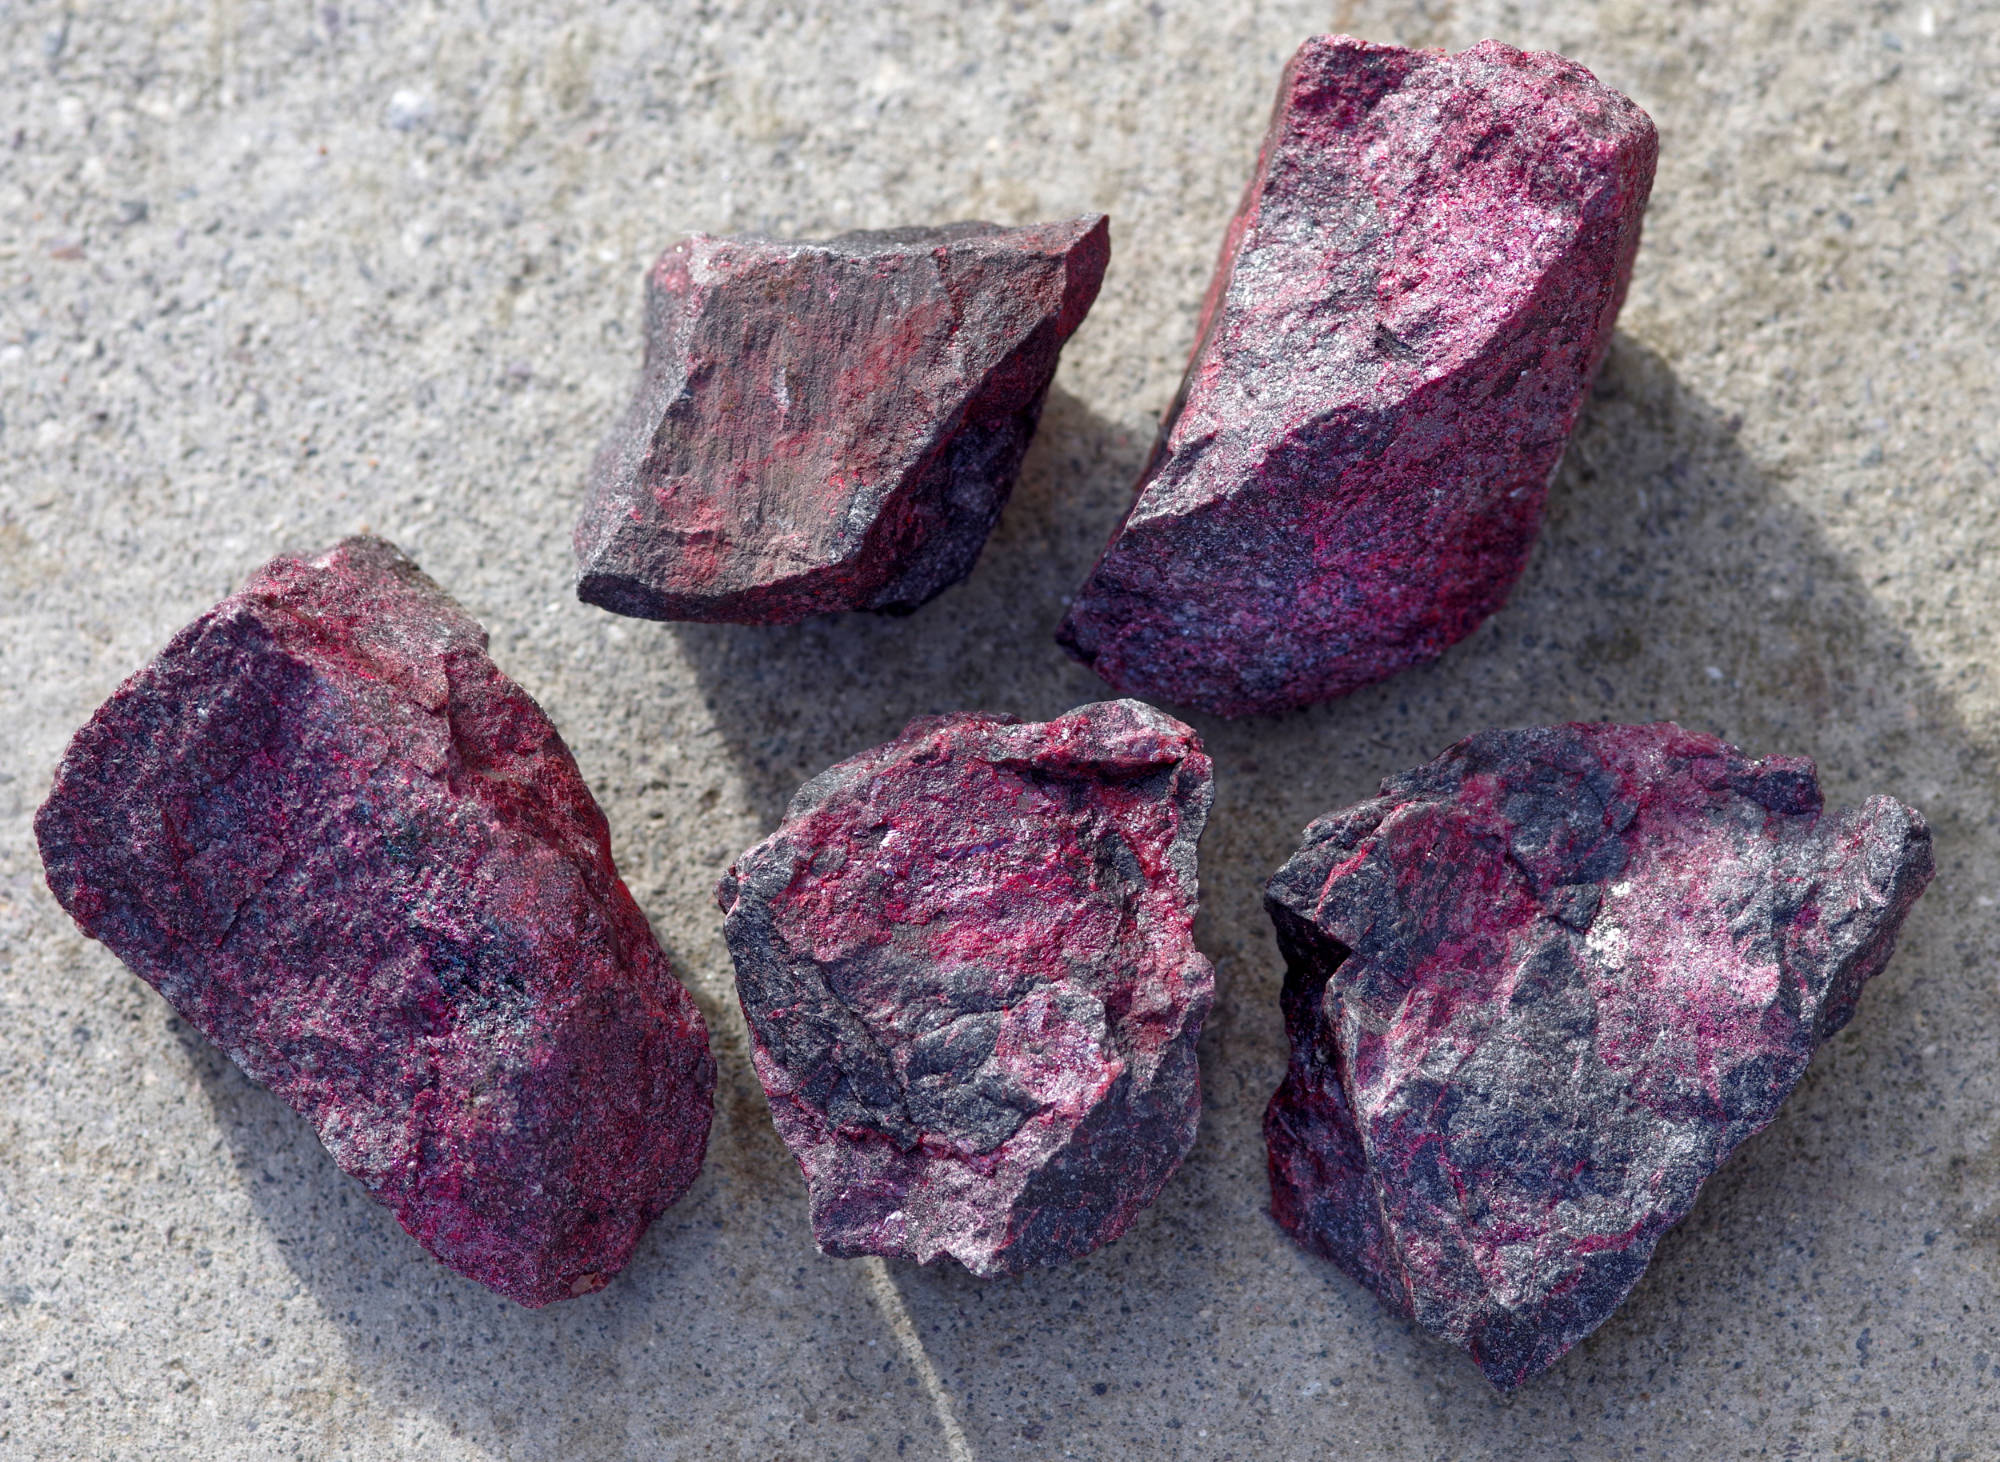 cinnabar pieces untreated